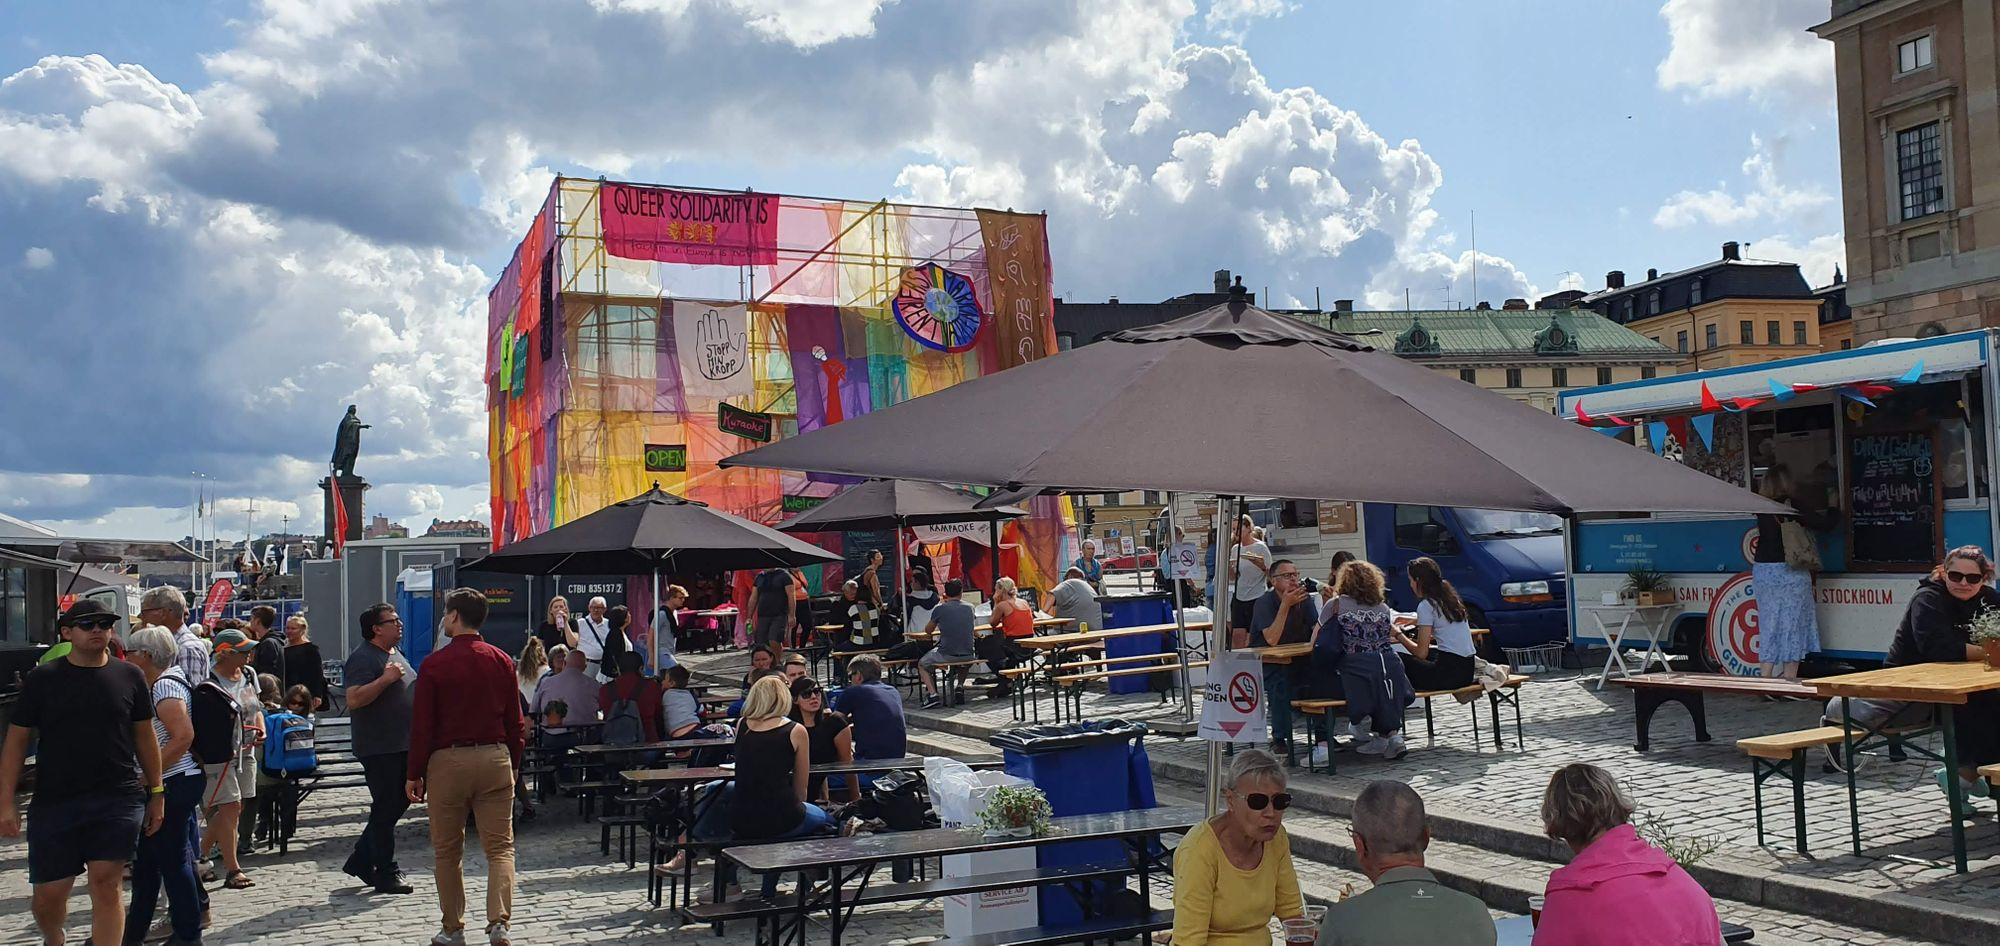 Carpa de la Diversidad en el Stockholms Kulturfestival